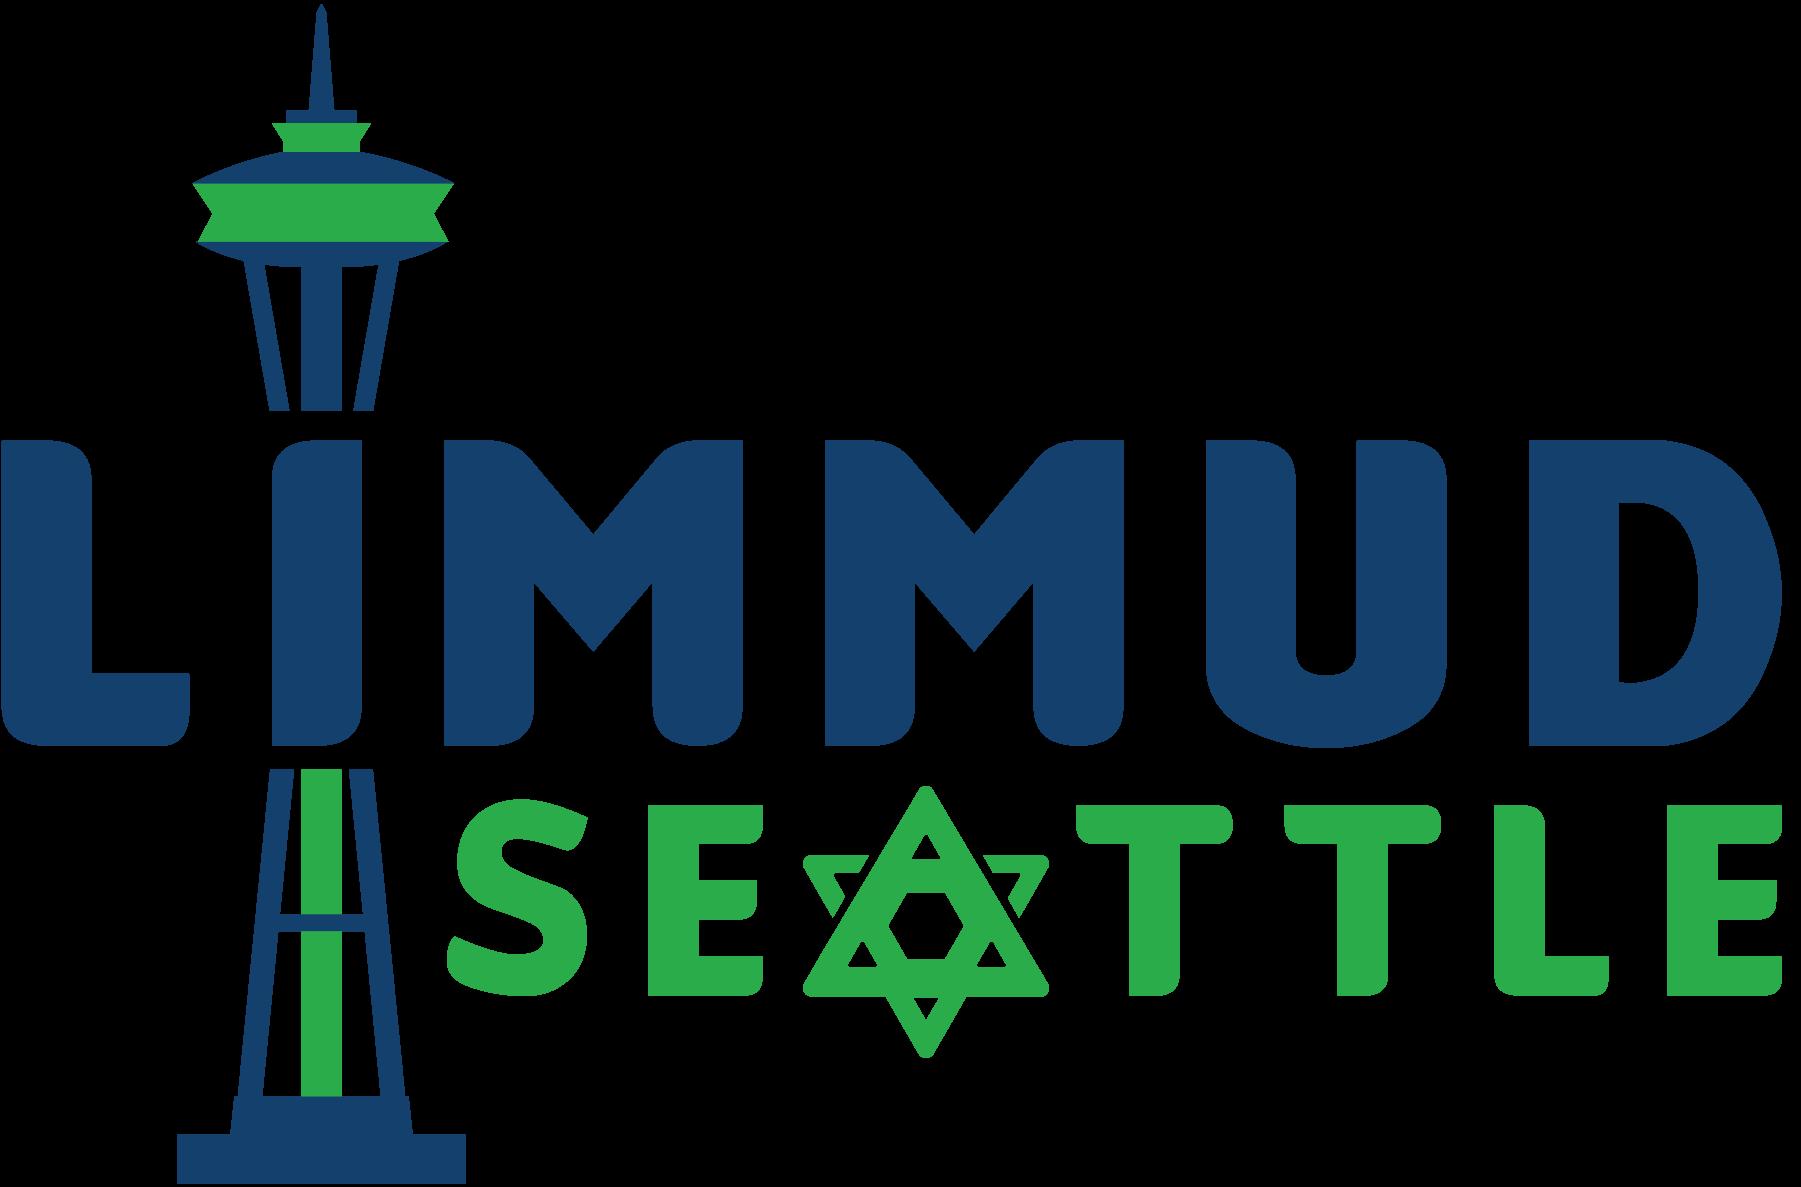 Limmud values . Volunteering clipart outreach program